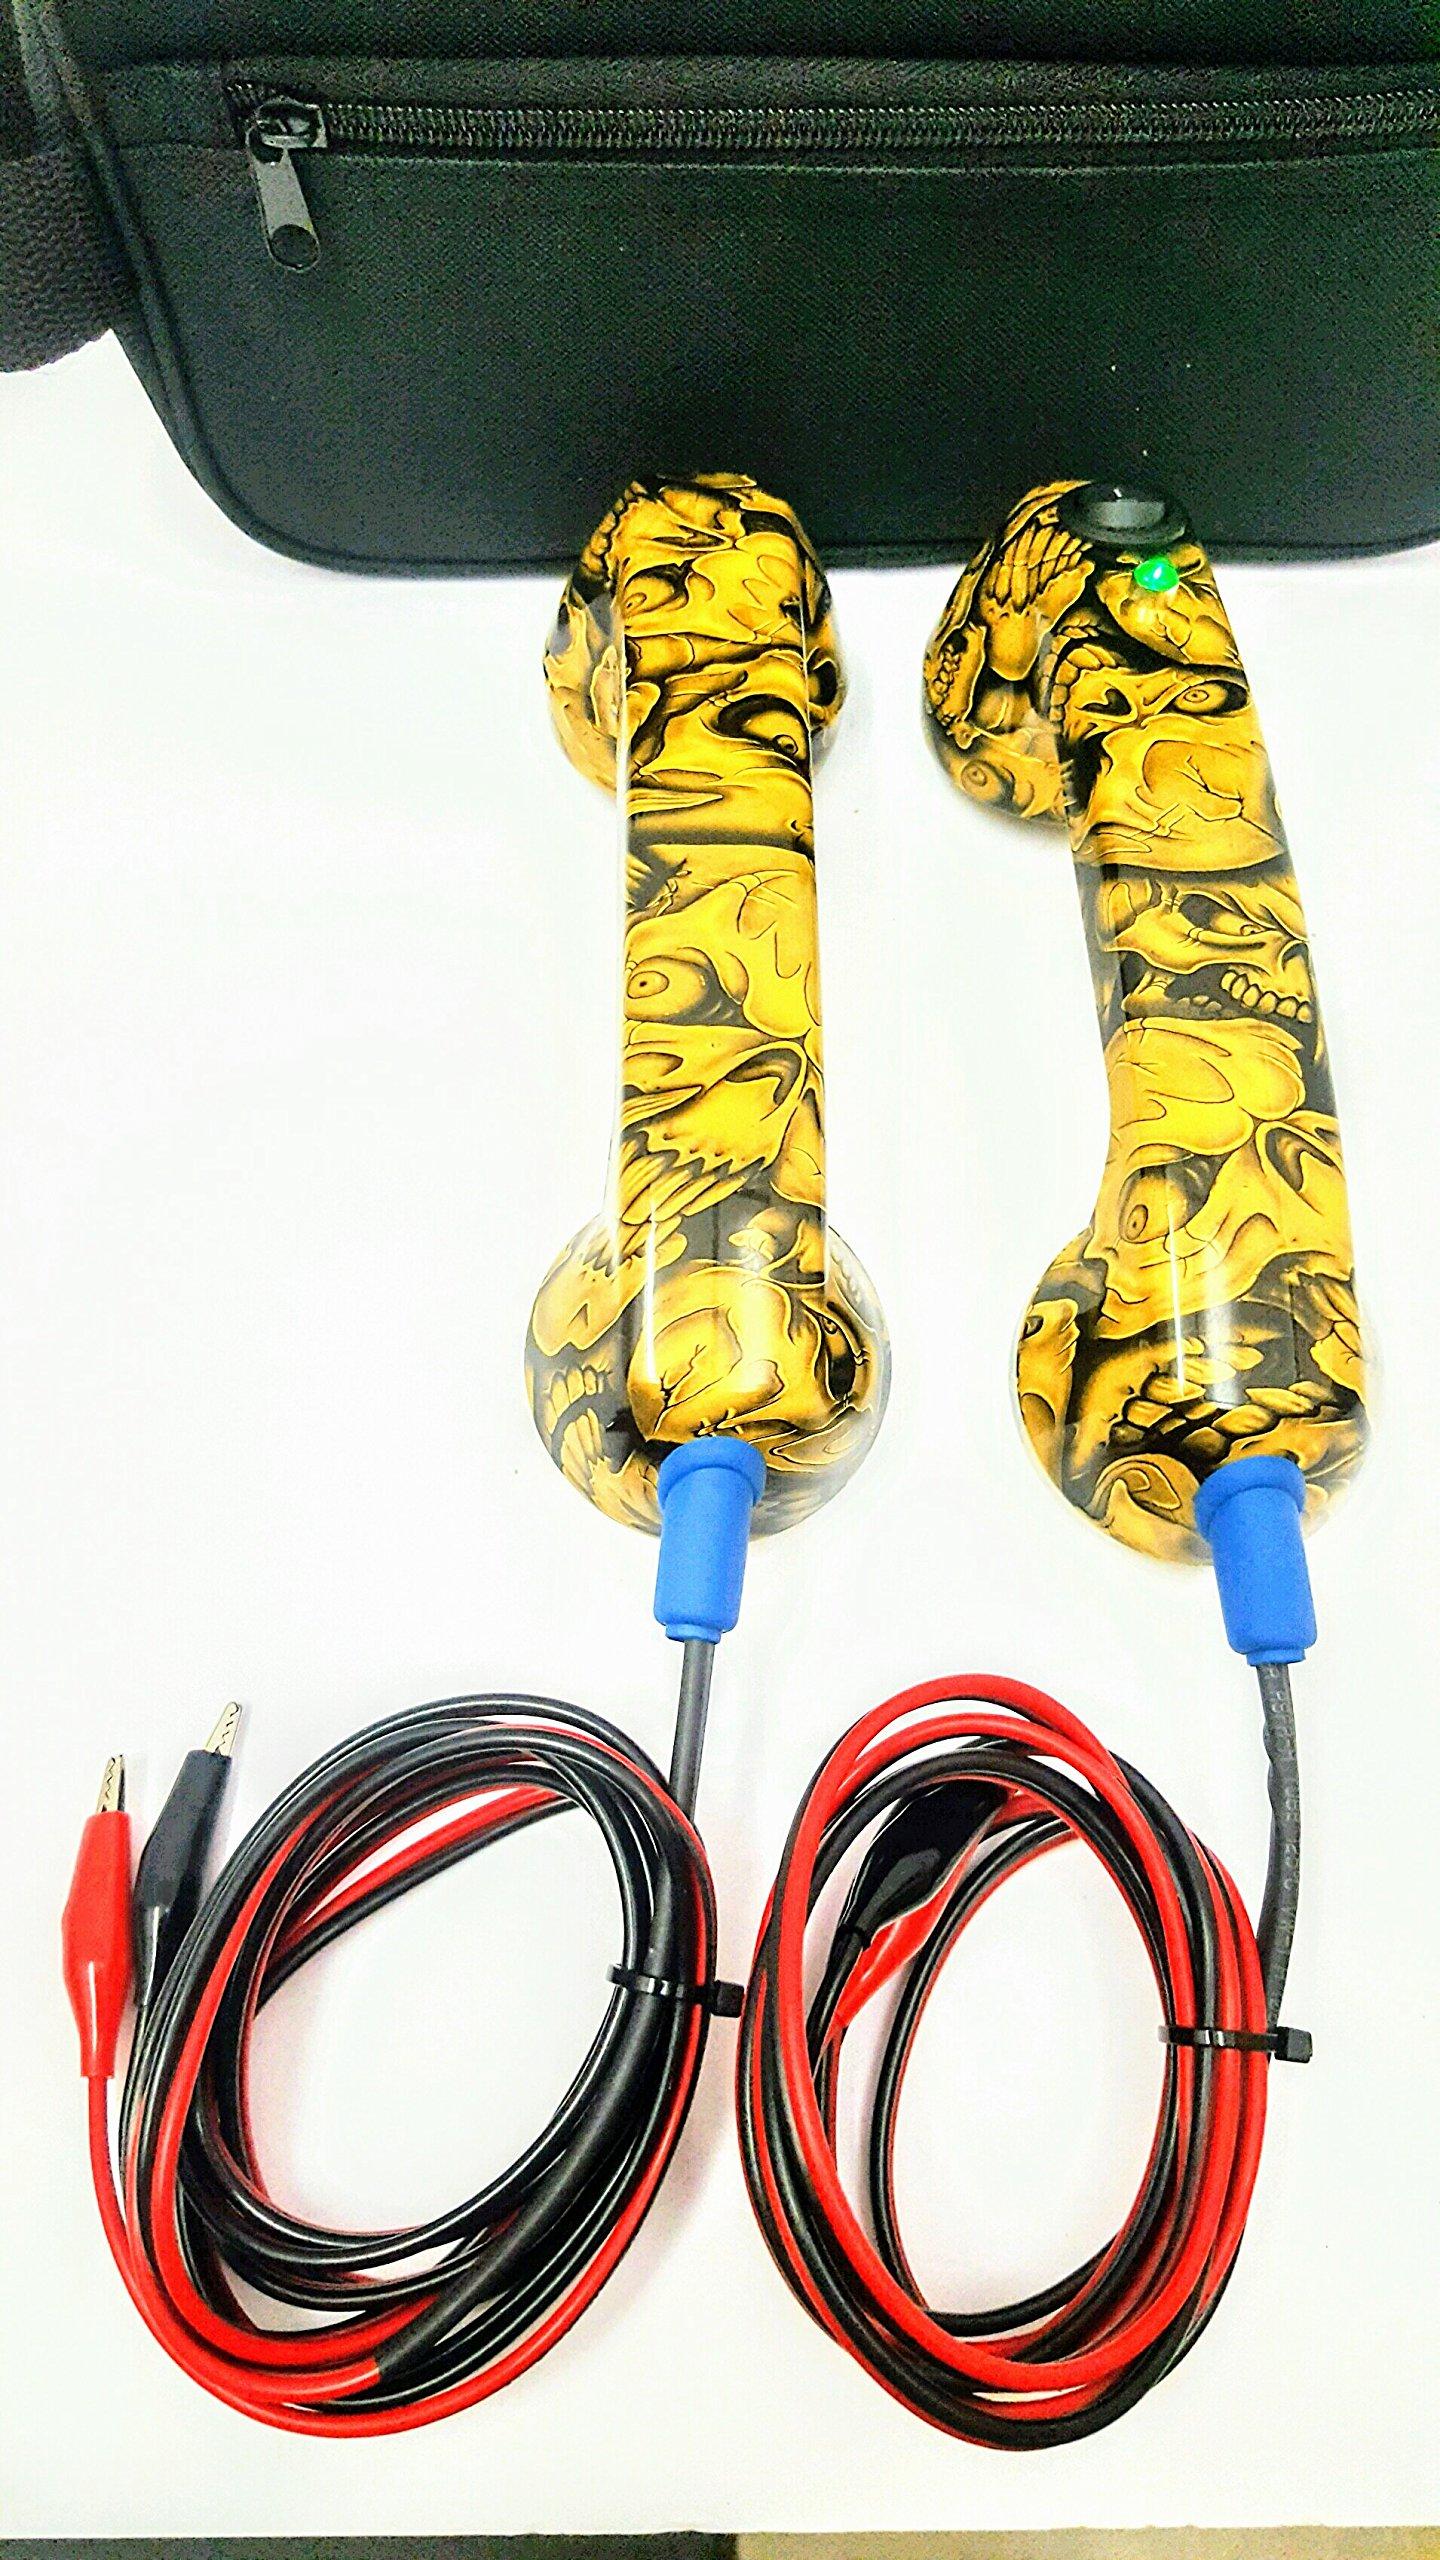 Loop Check Phone/ Electrician Test Phone